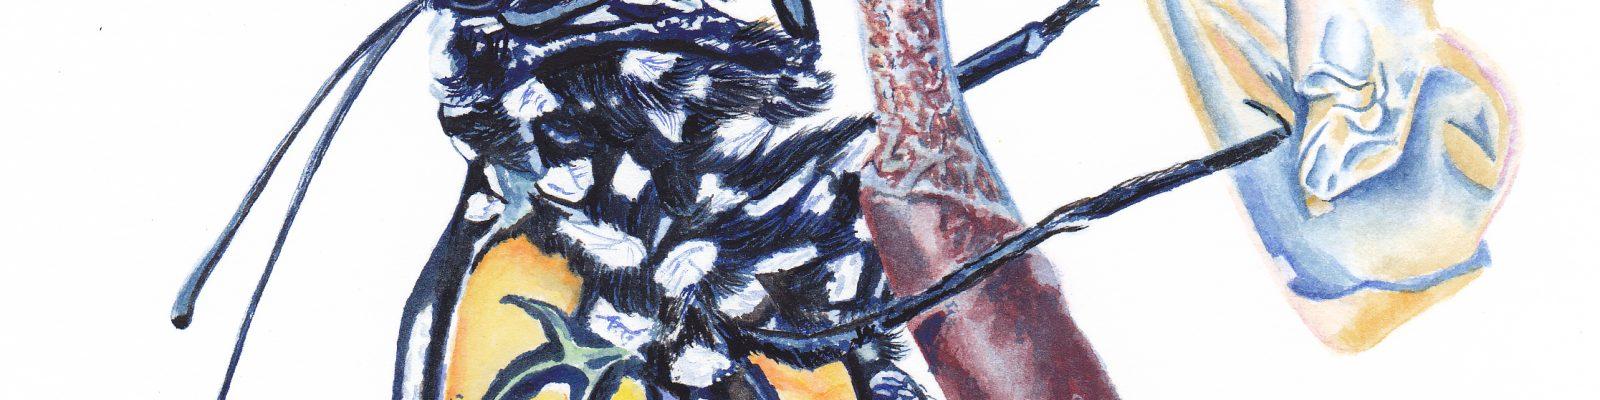 Emerge. Gouache 7.5x10.5 Brandi Malarkey, Artist. ItsAllMalarkey.com